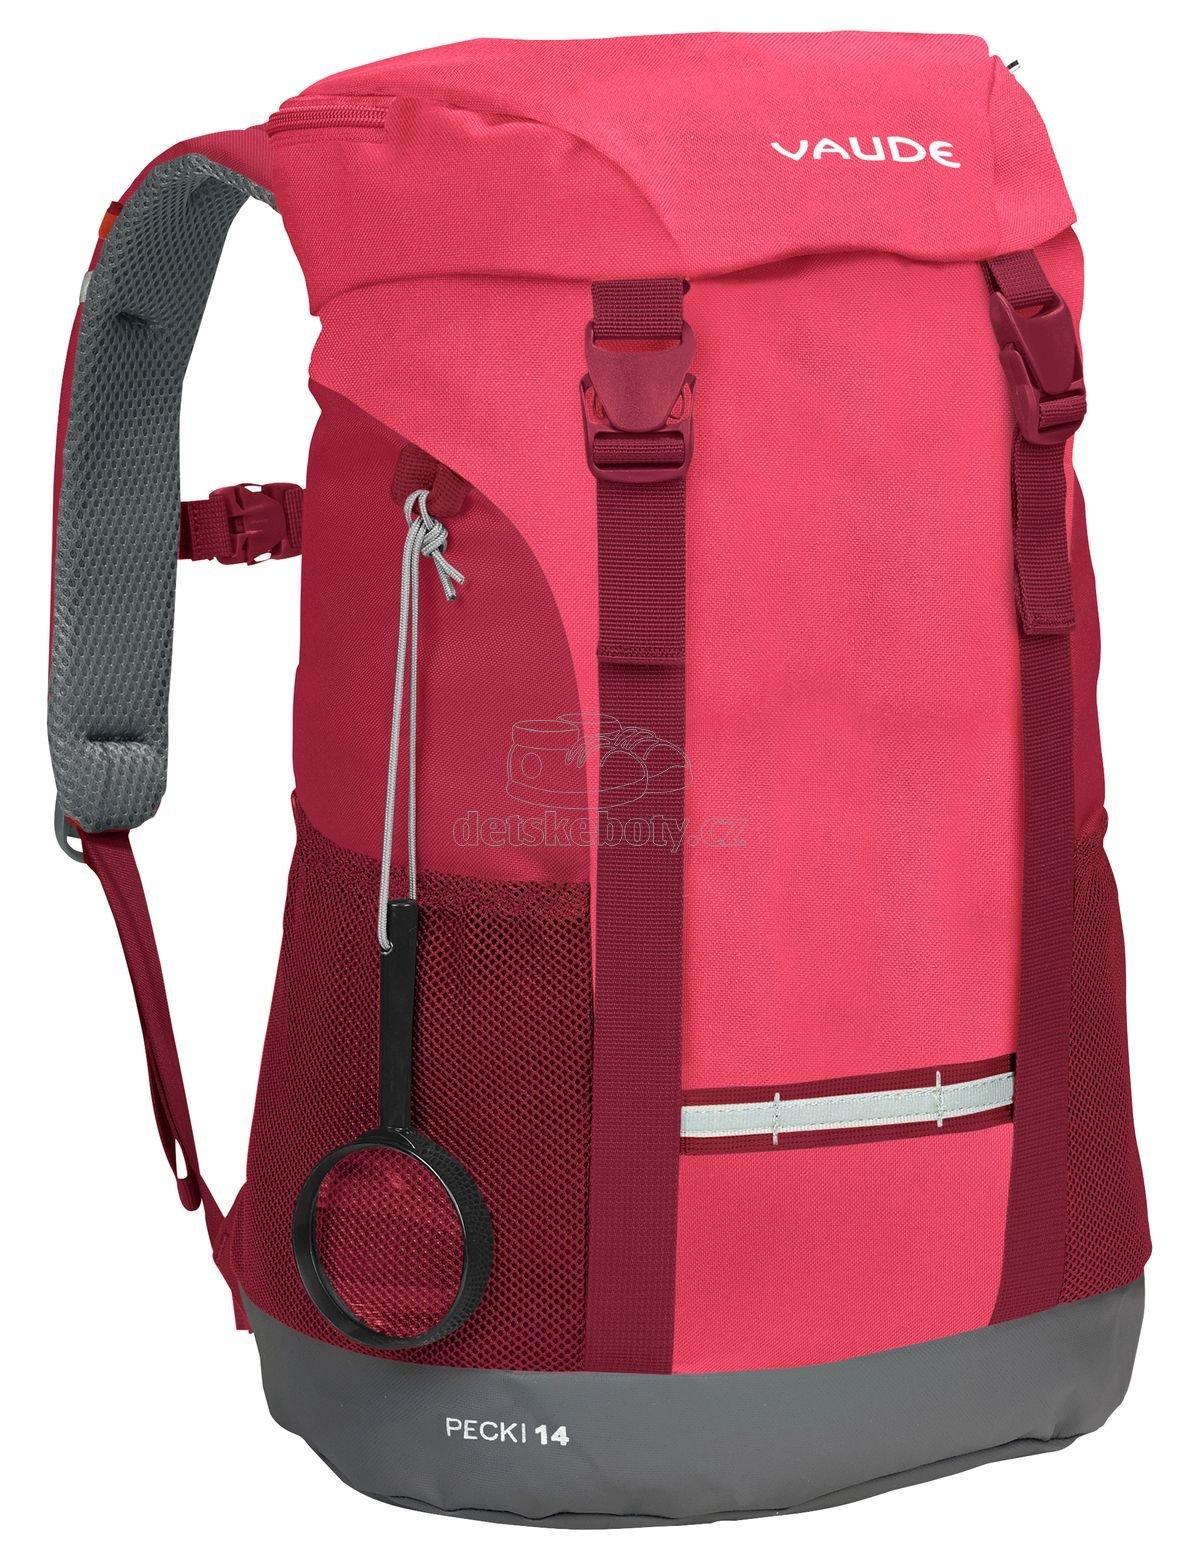 Vaude Pecki 14 bright pink